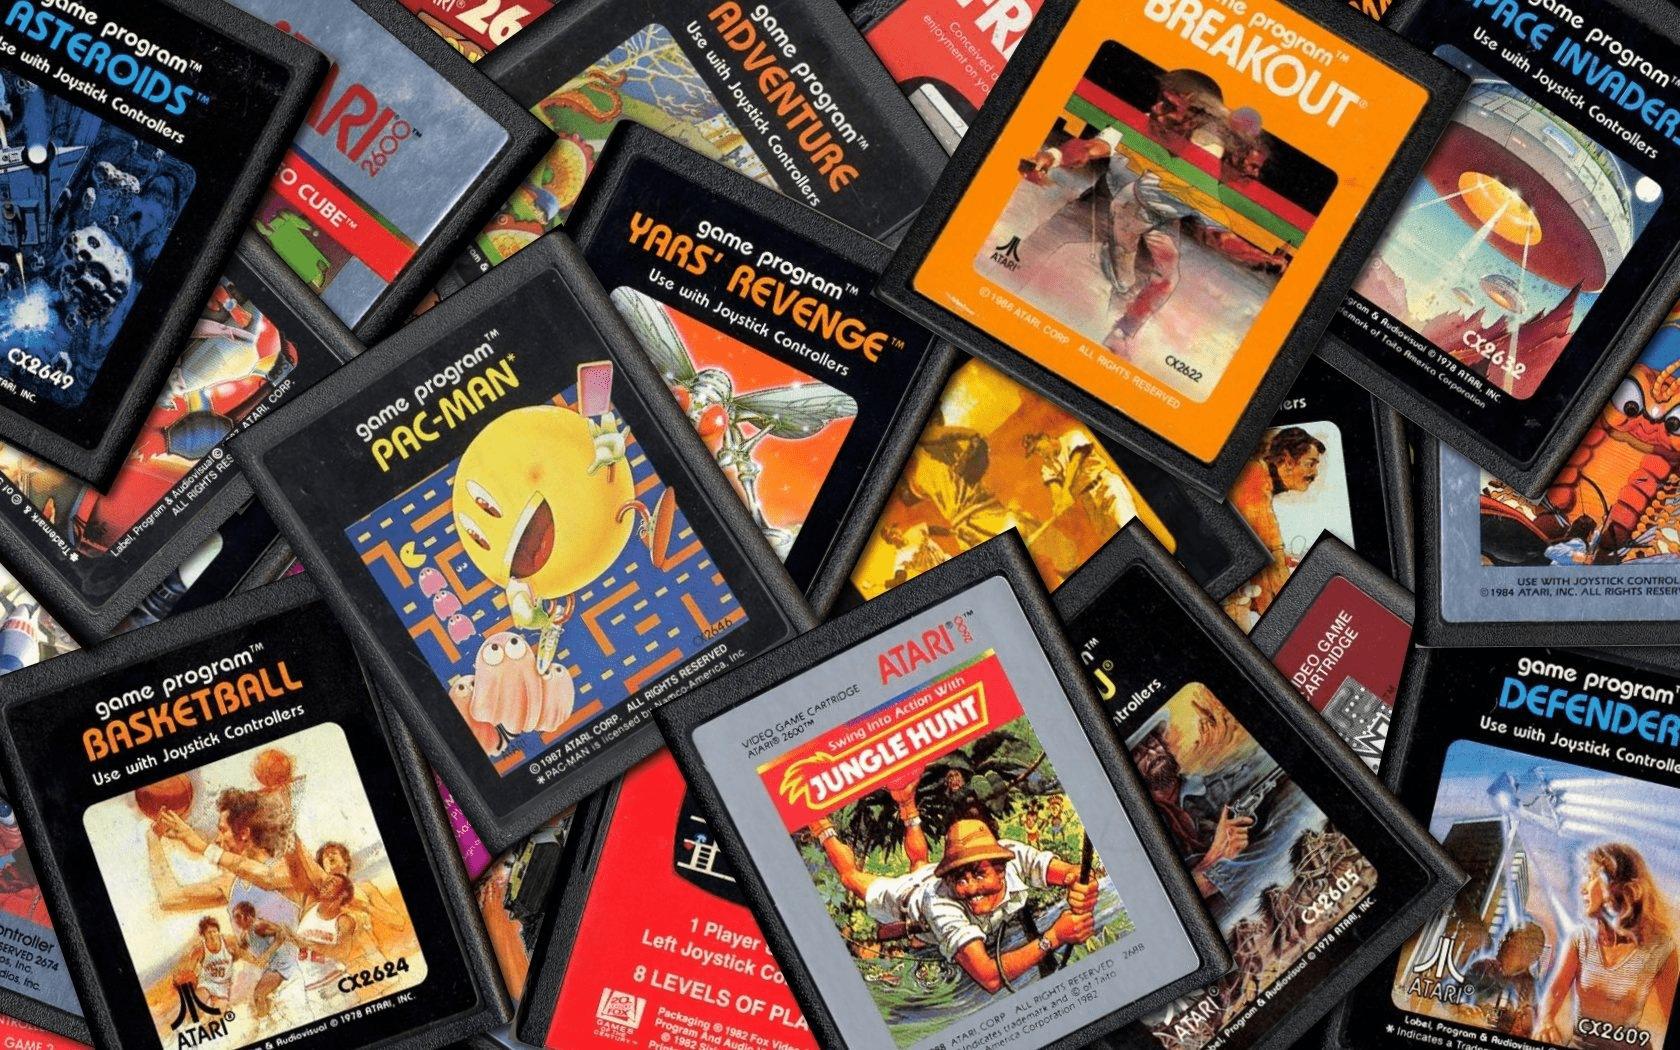 Atari-cartridges_waifu2x_photo_noise0_tta_1.png